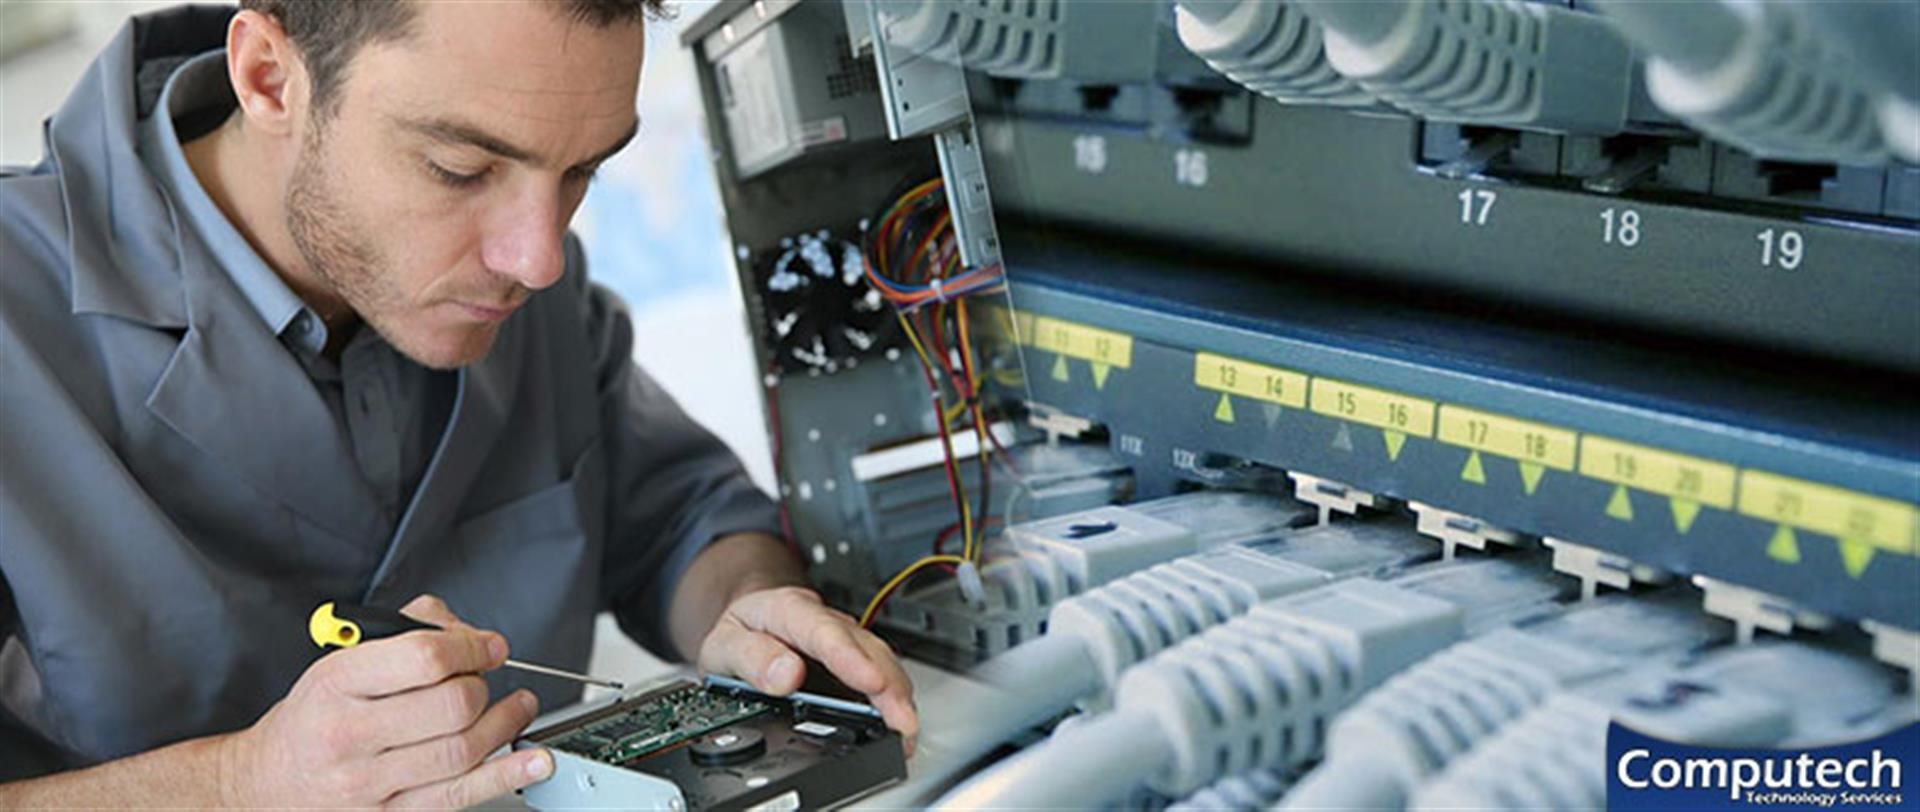 Rincon Georgia On-Site PC & Printer Repair, Networking, Voice & Data Cabling Contractors